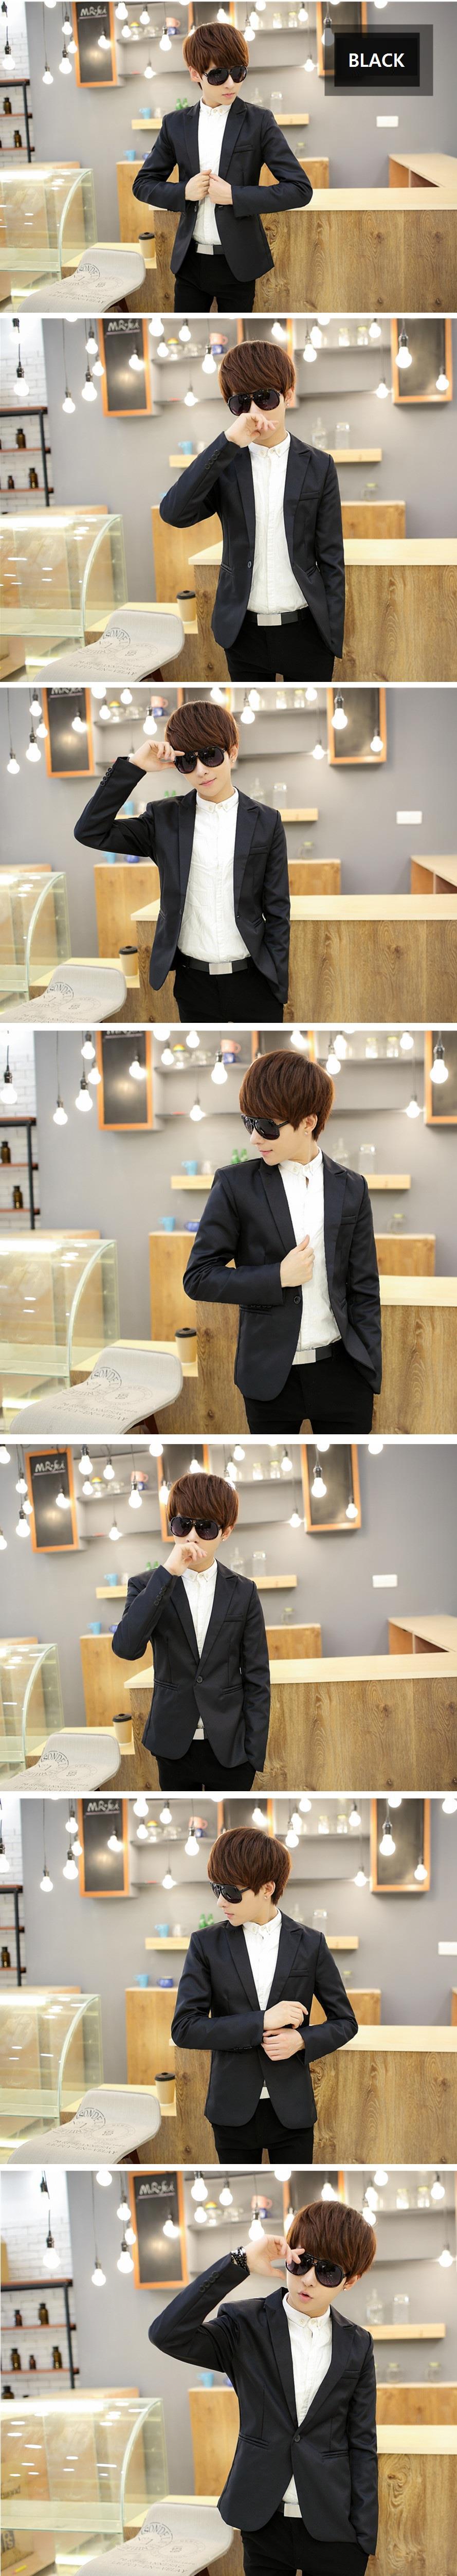 Ms0061d Korean Casual Slim Solid Co End 11 19 2019 815 Pm Black Blazer Jaket Korea Style Sk 15 Color Suit Jacket